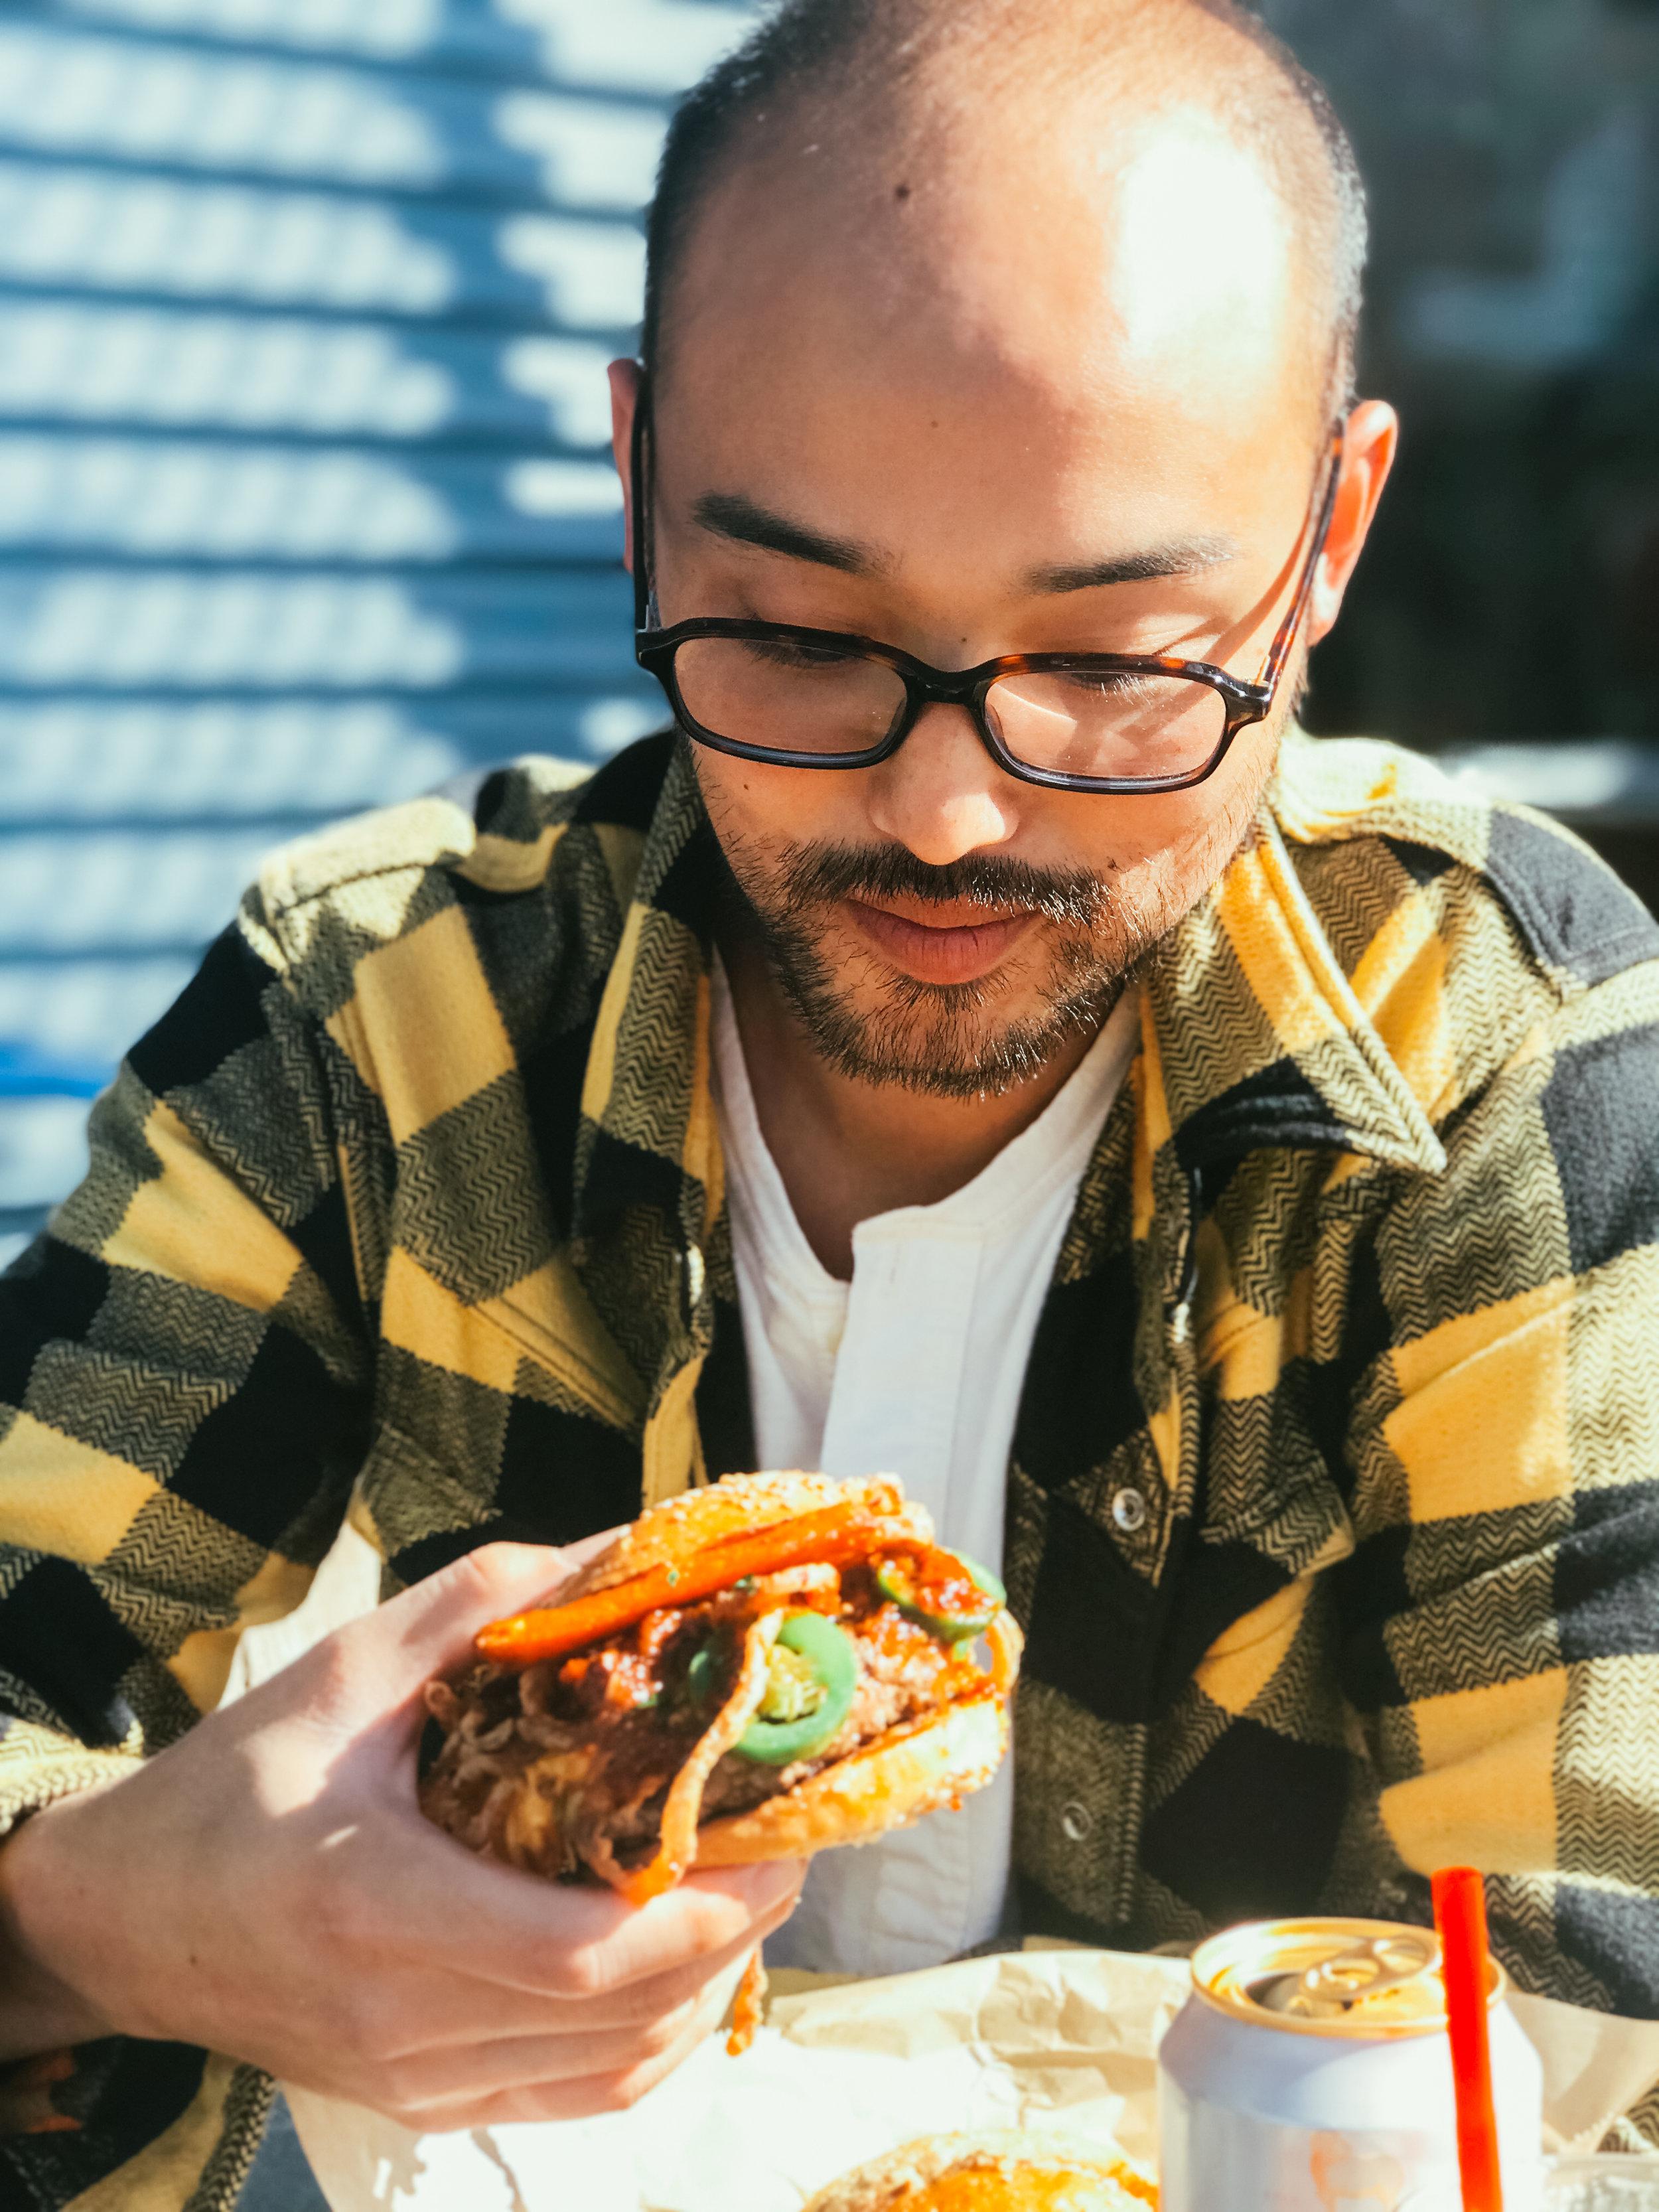 I'm always eating.  Glasses - JINS | Shirt - The Flat Head | Henley - Homespun Knitwear